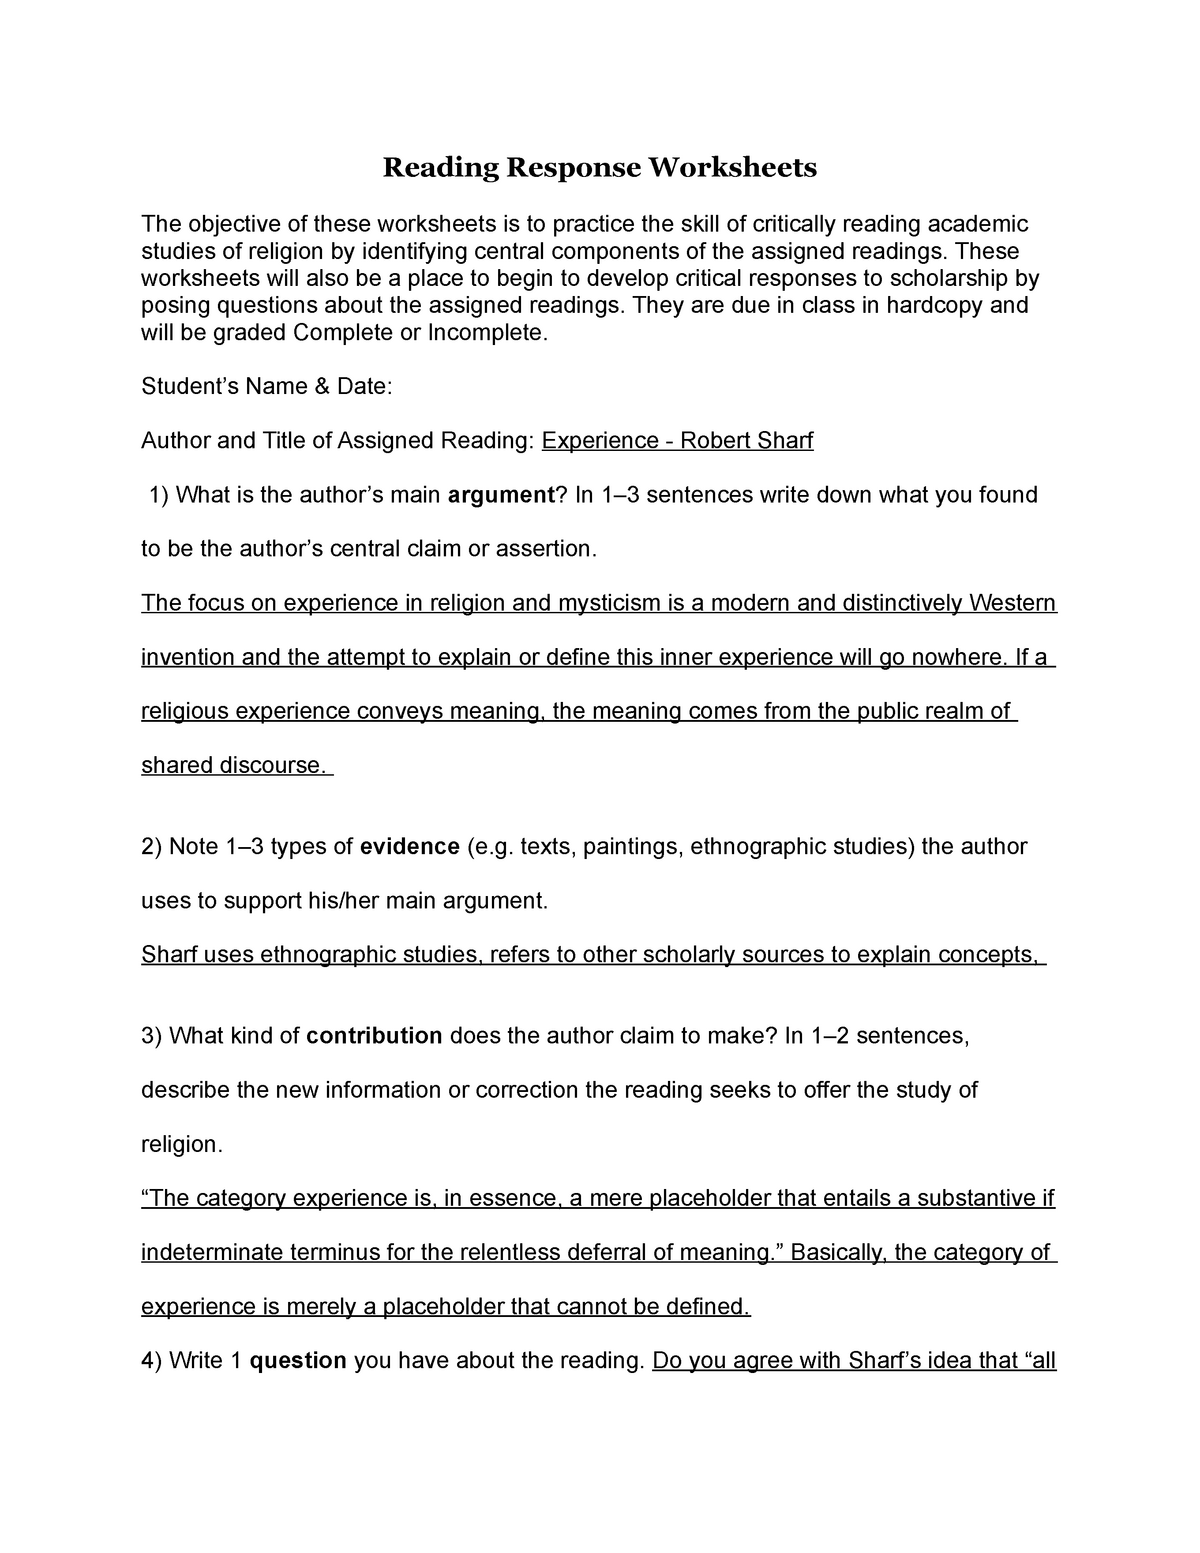 Experience - Sharf Reading Response Worksheet - RELS 2600